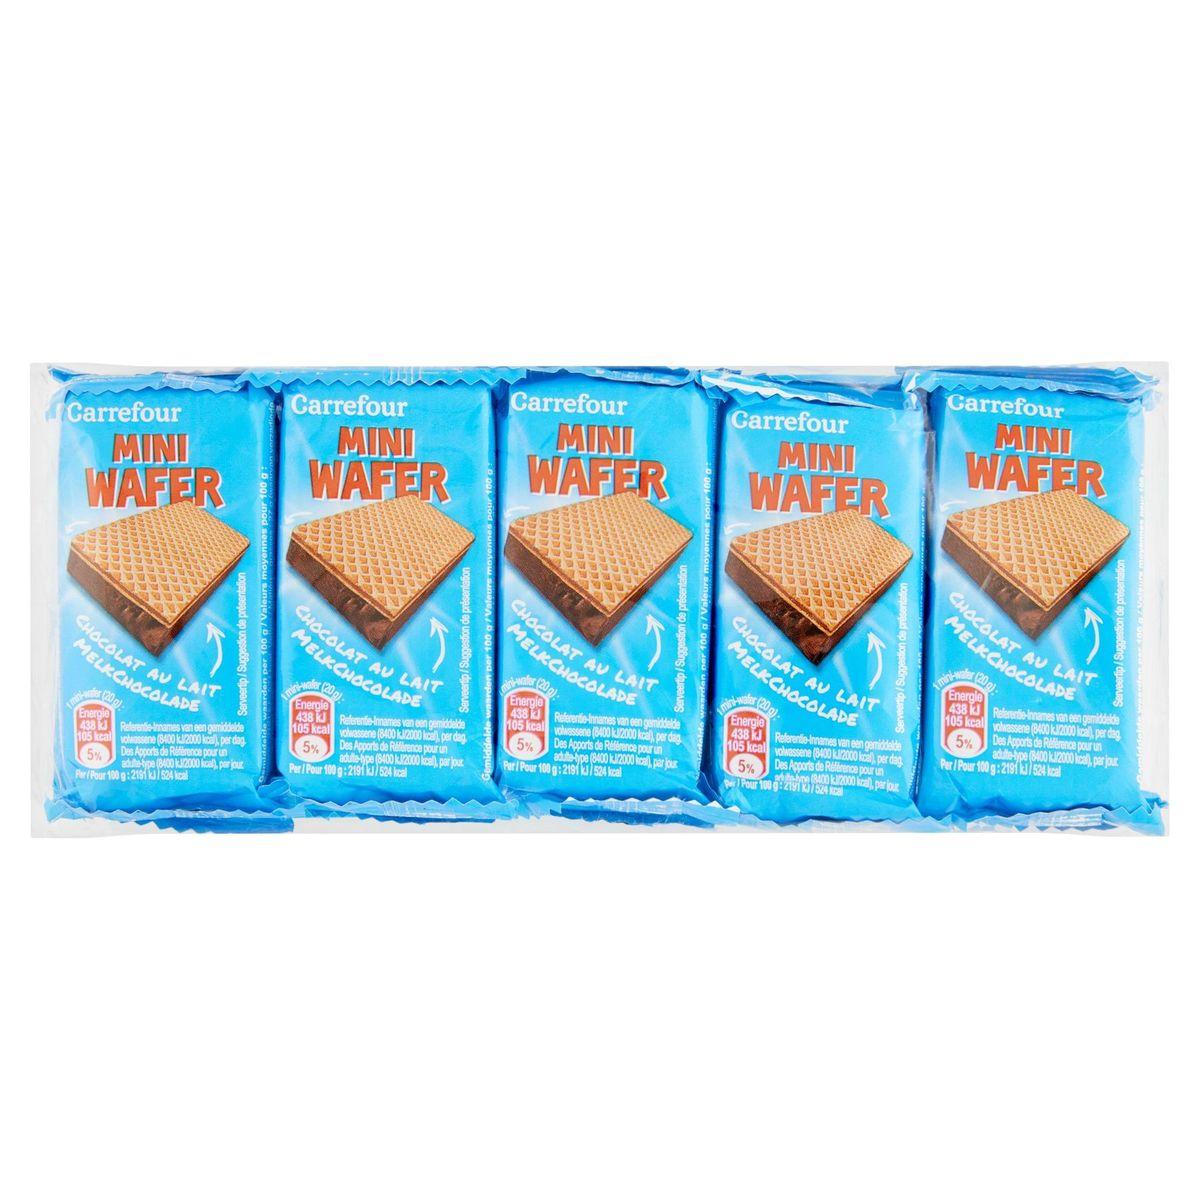 Carrefour Mini Wafer Melkchocolade 10 x 20 g